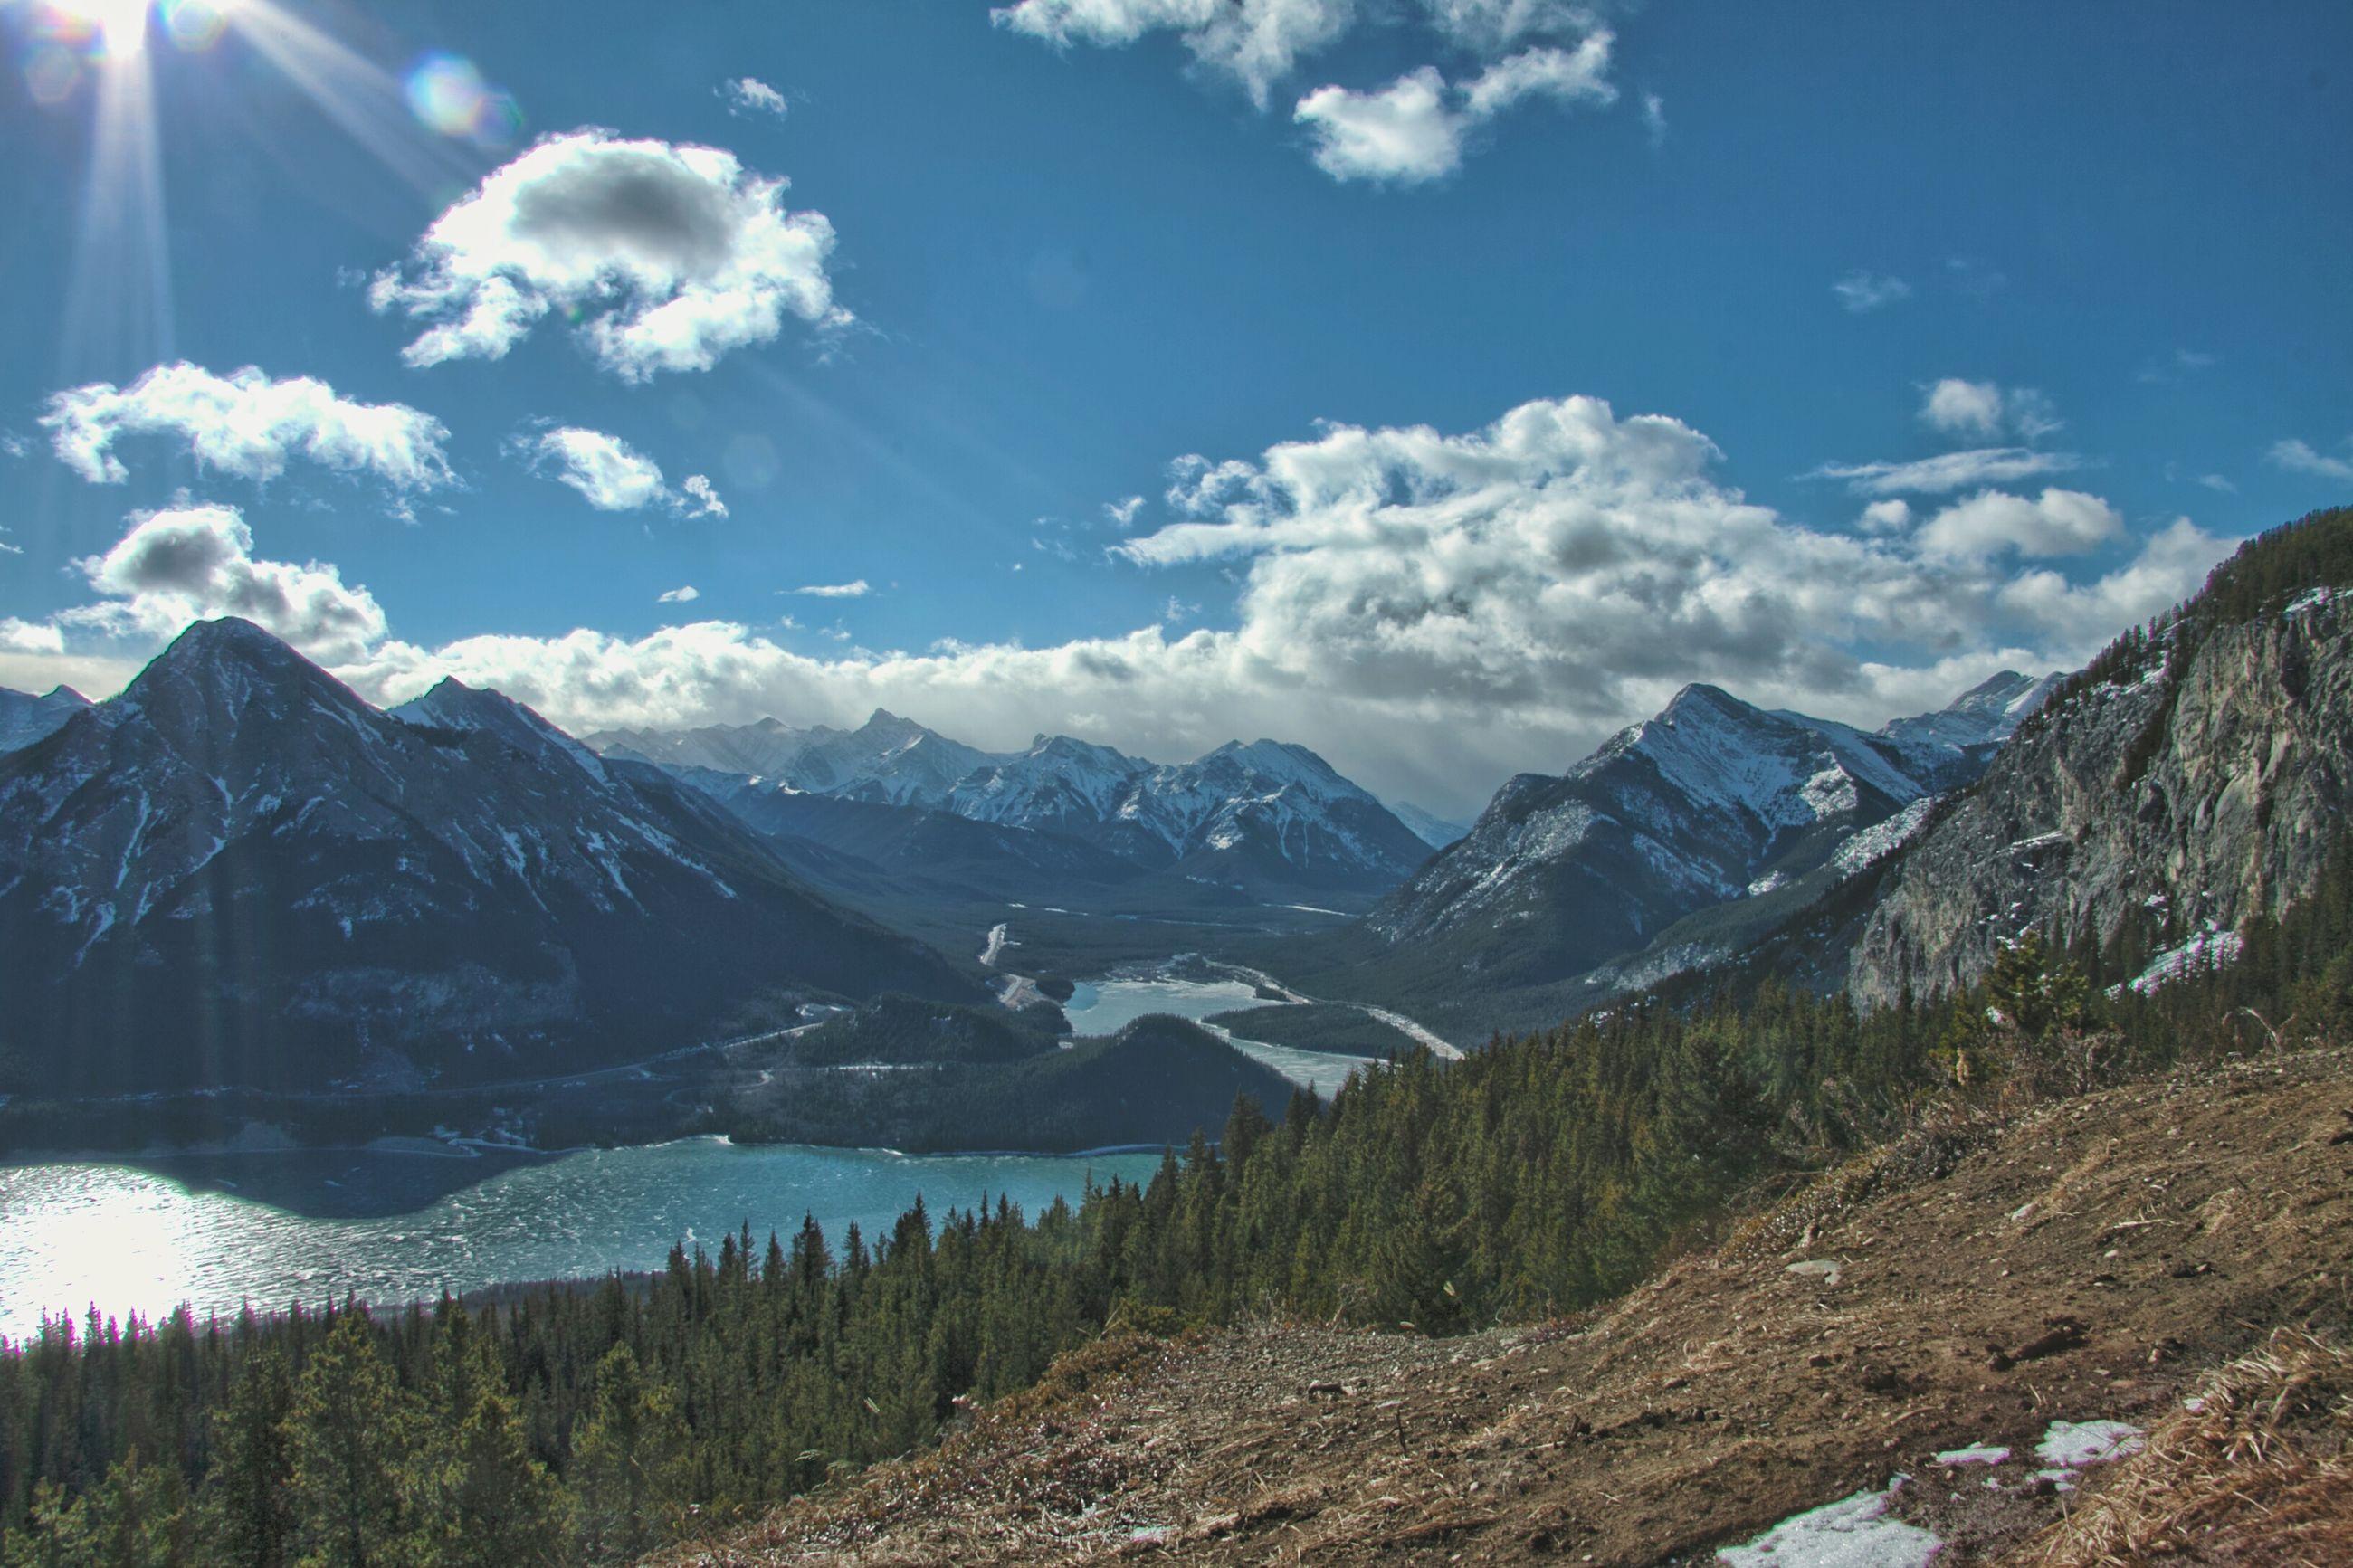 mountain, mountain range, tranquil scene, tranquility, scenics, sky, beauty in nature, water, nature, landscape, lake, sunlight, cloud - sky, idyllic, non-urban scene, cloud, river, blue, sunbeam, outdoors